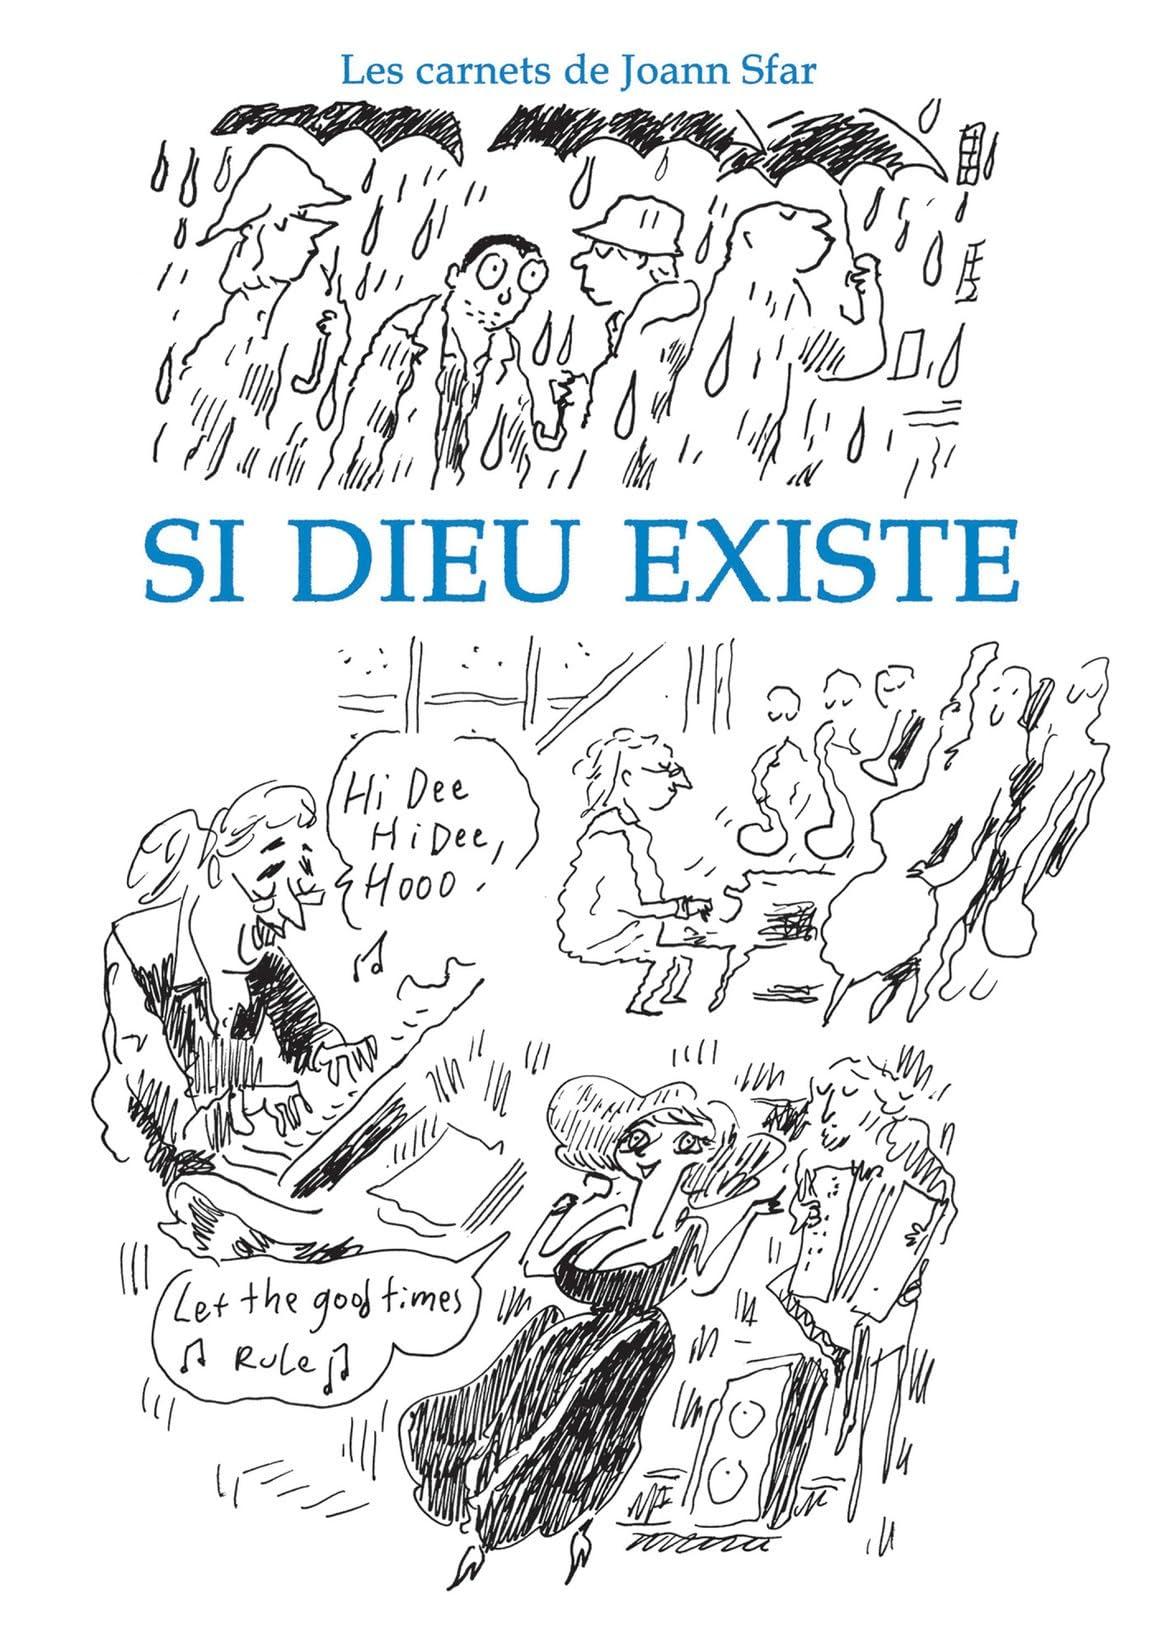 Carnets de Joann Sfar: Si Dieu existe